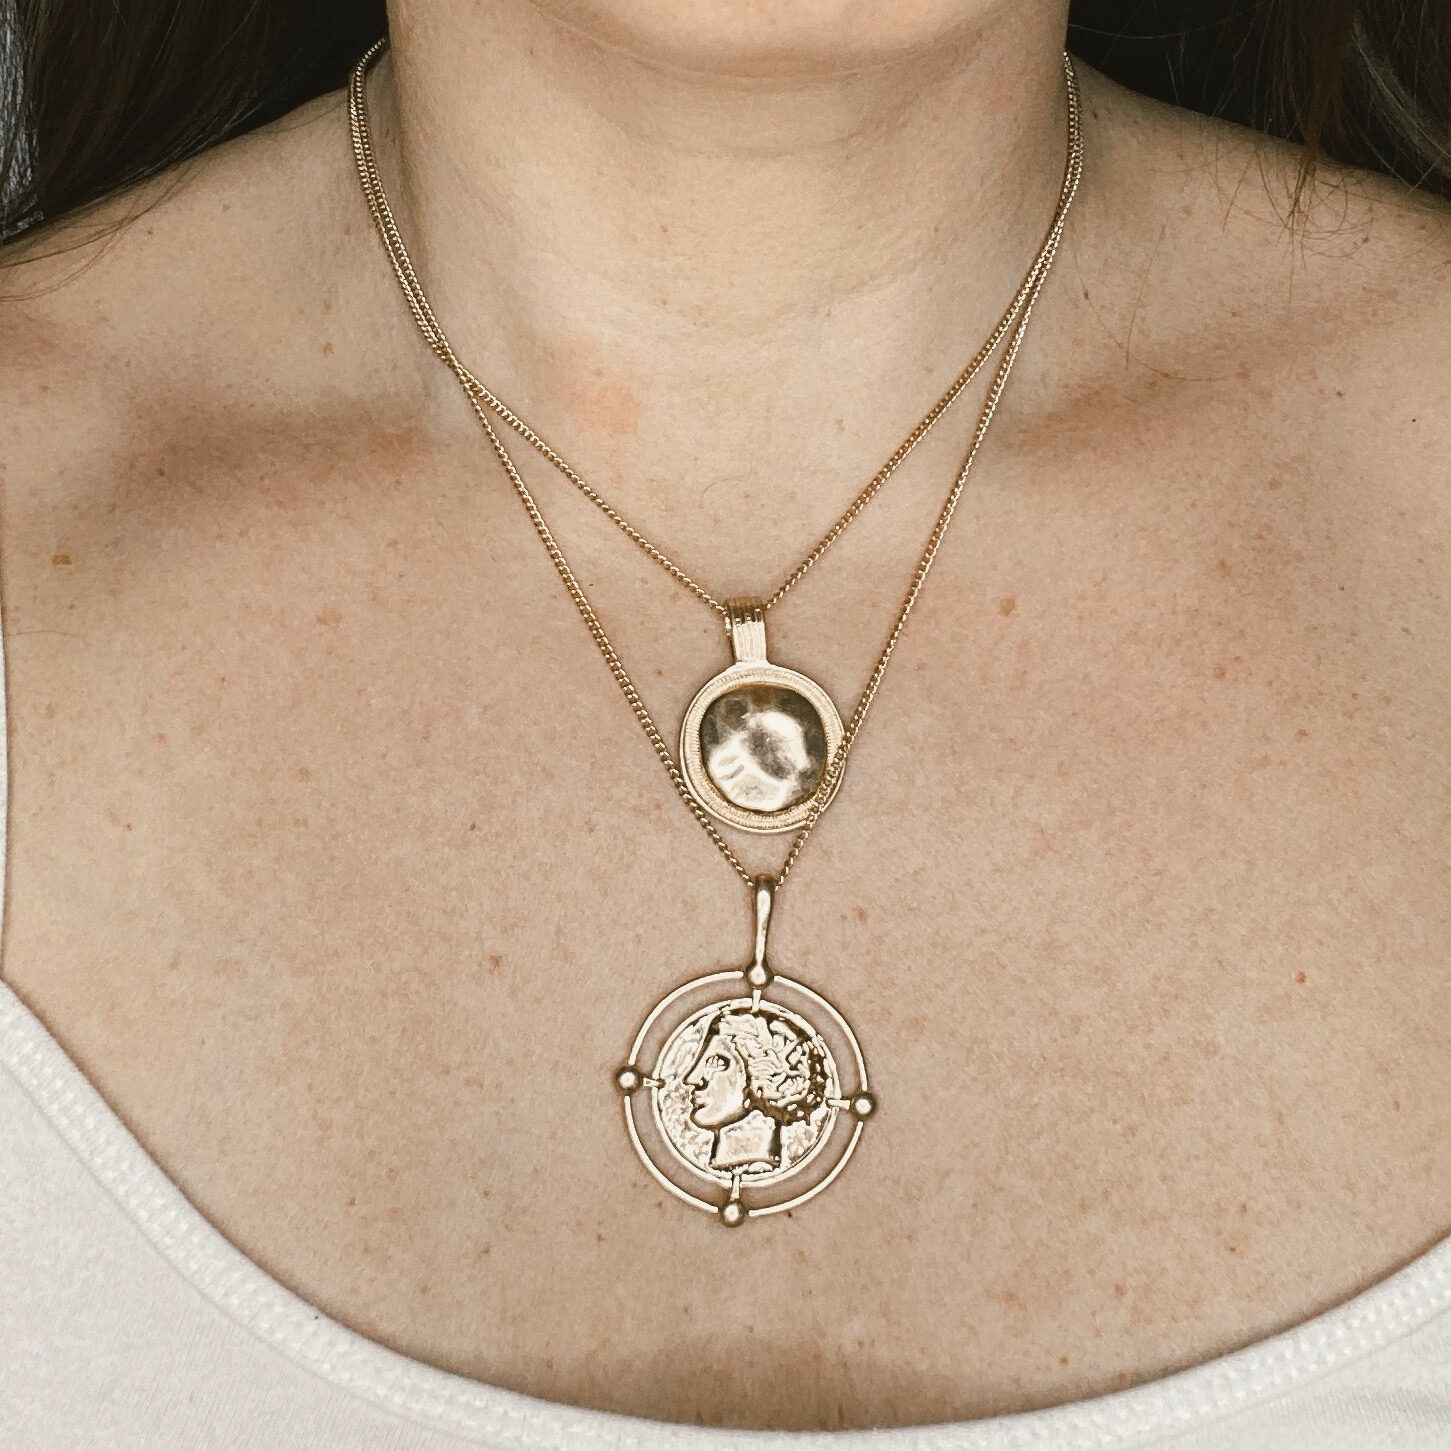 Medusa Coin Necklace